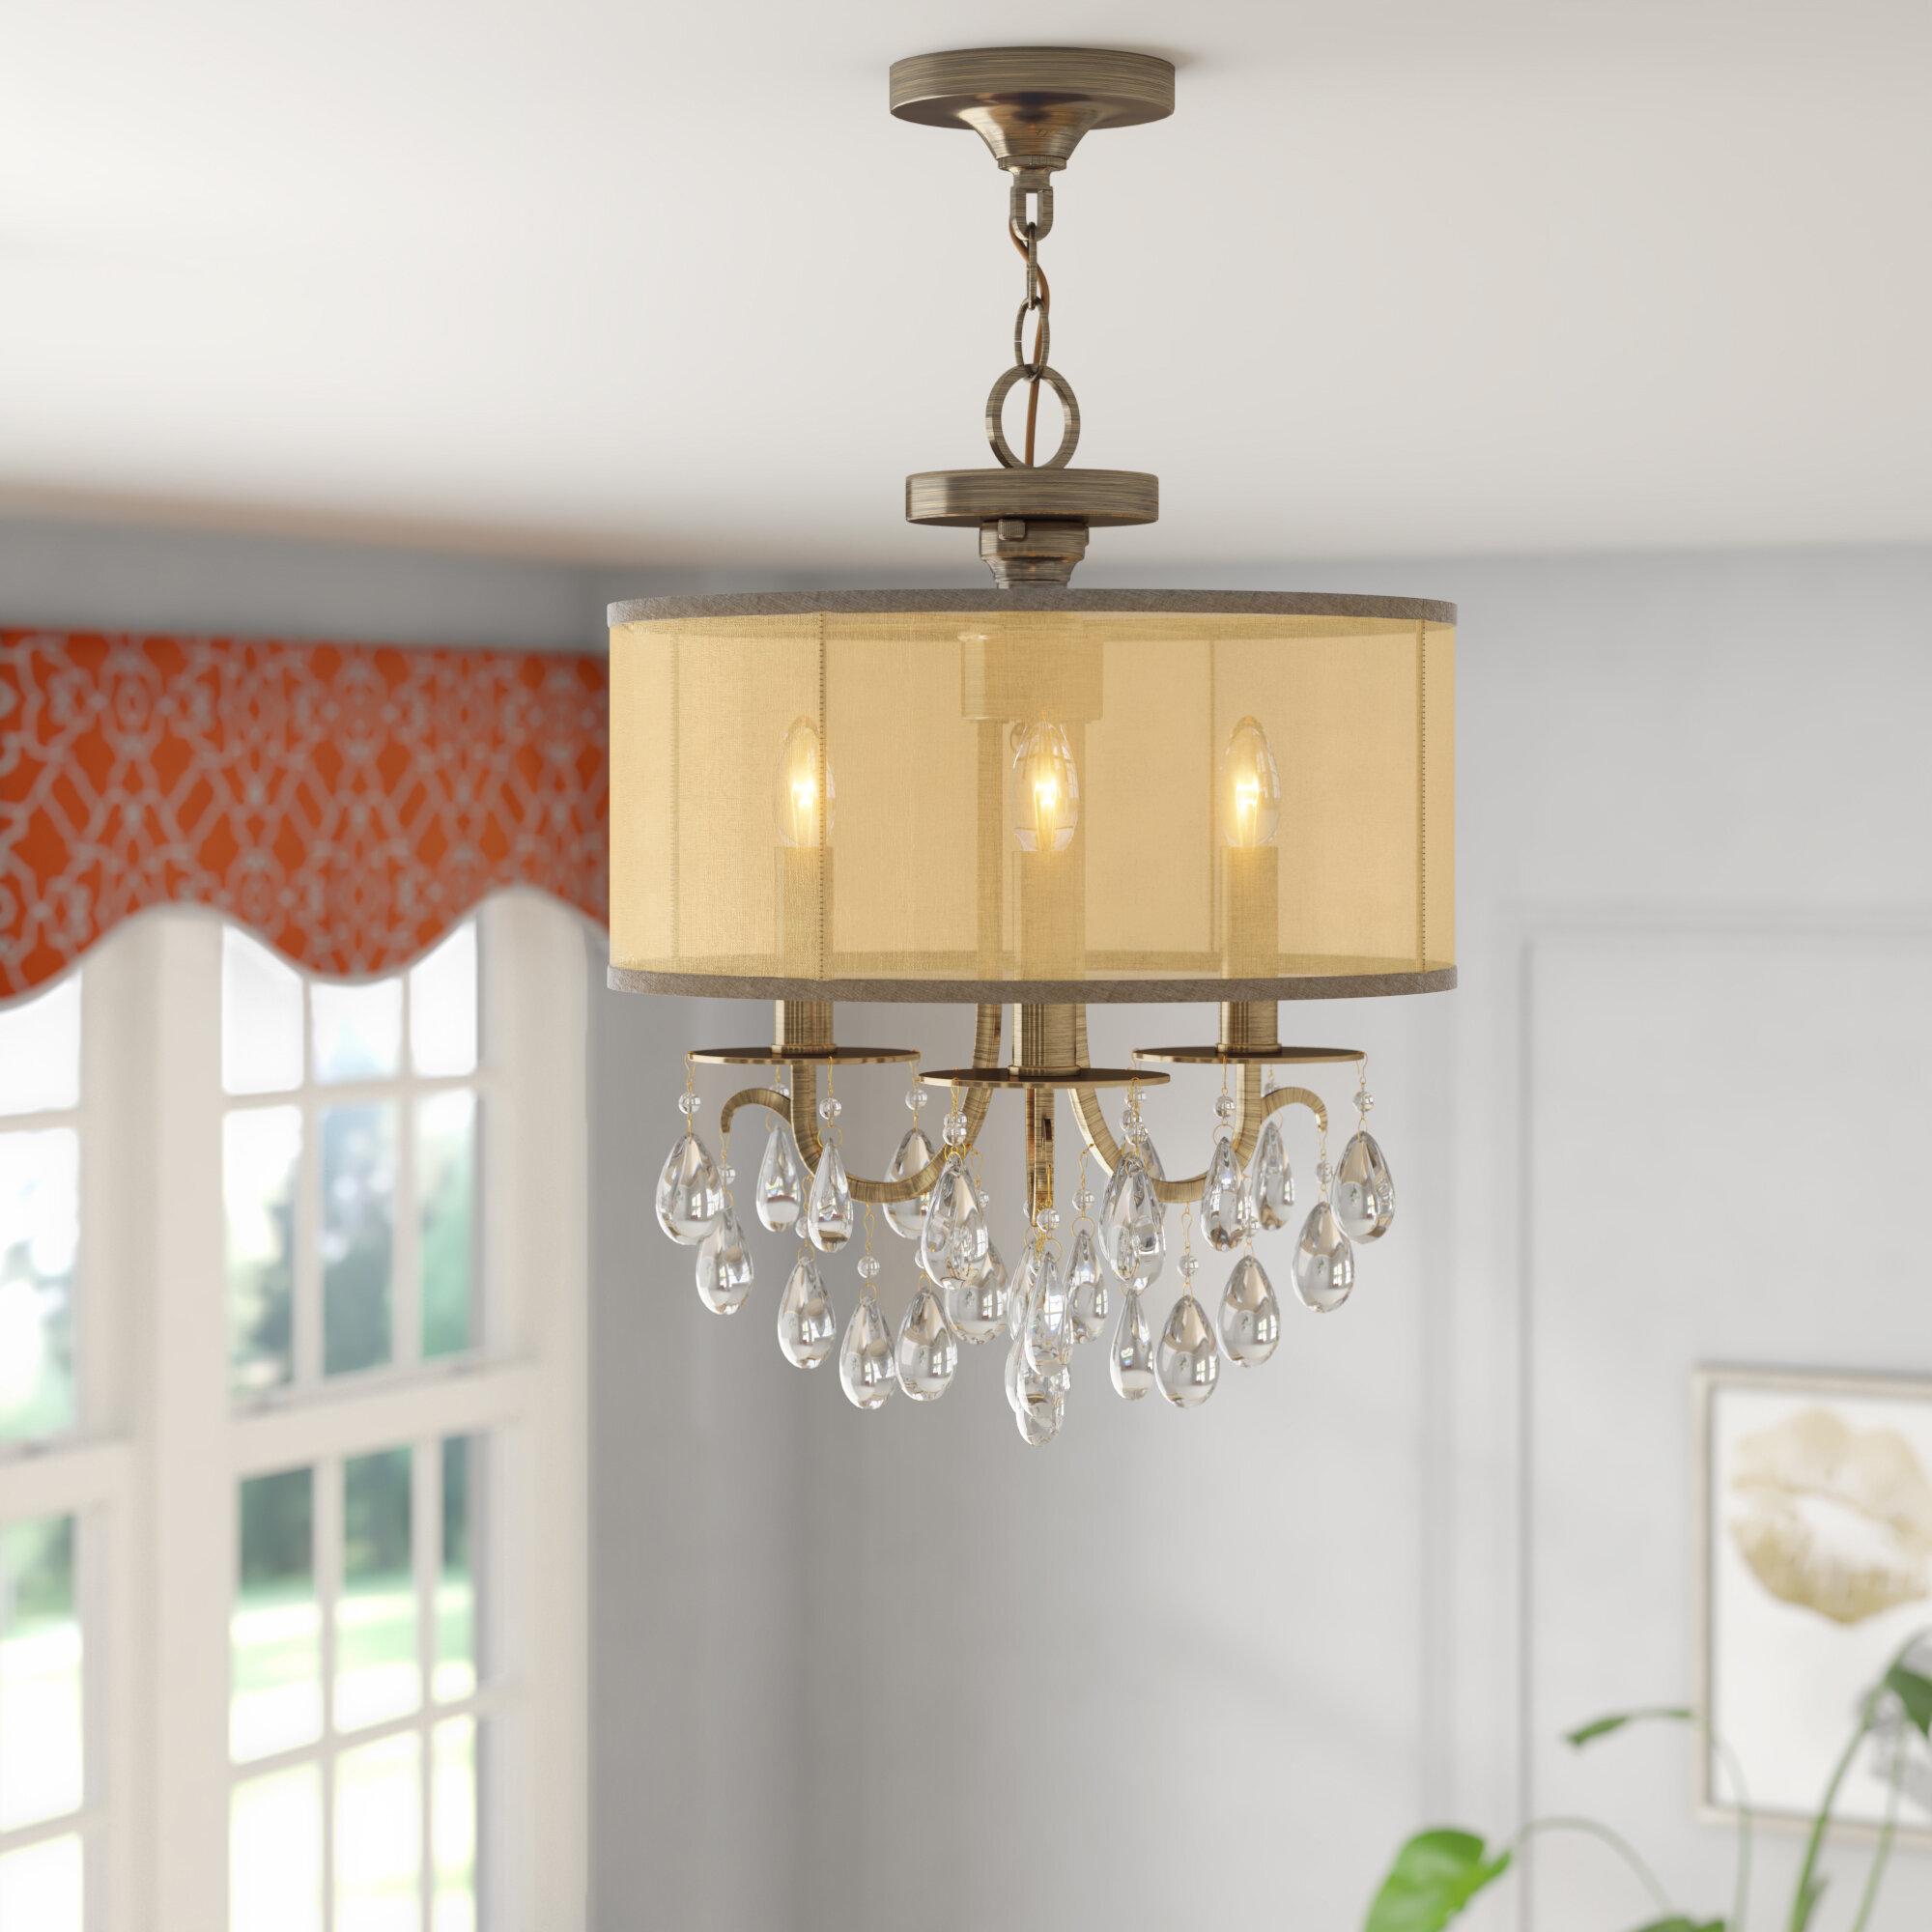 Willa arlo interiors aayush 3 light chandelier reviews wayfair